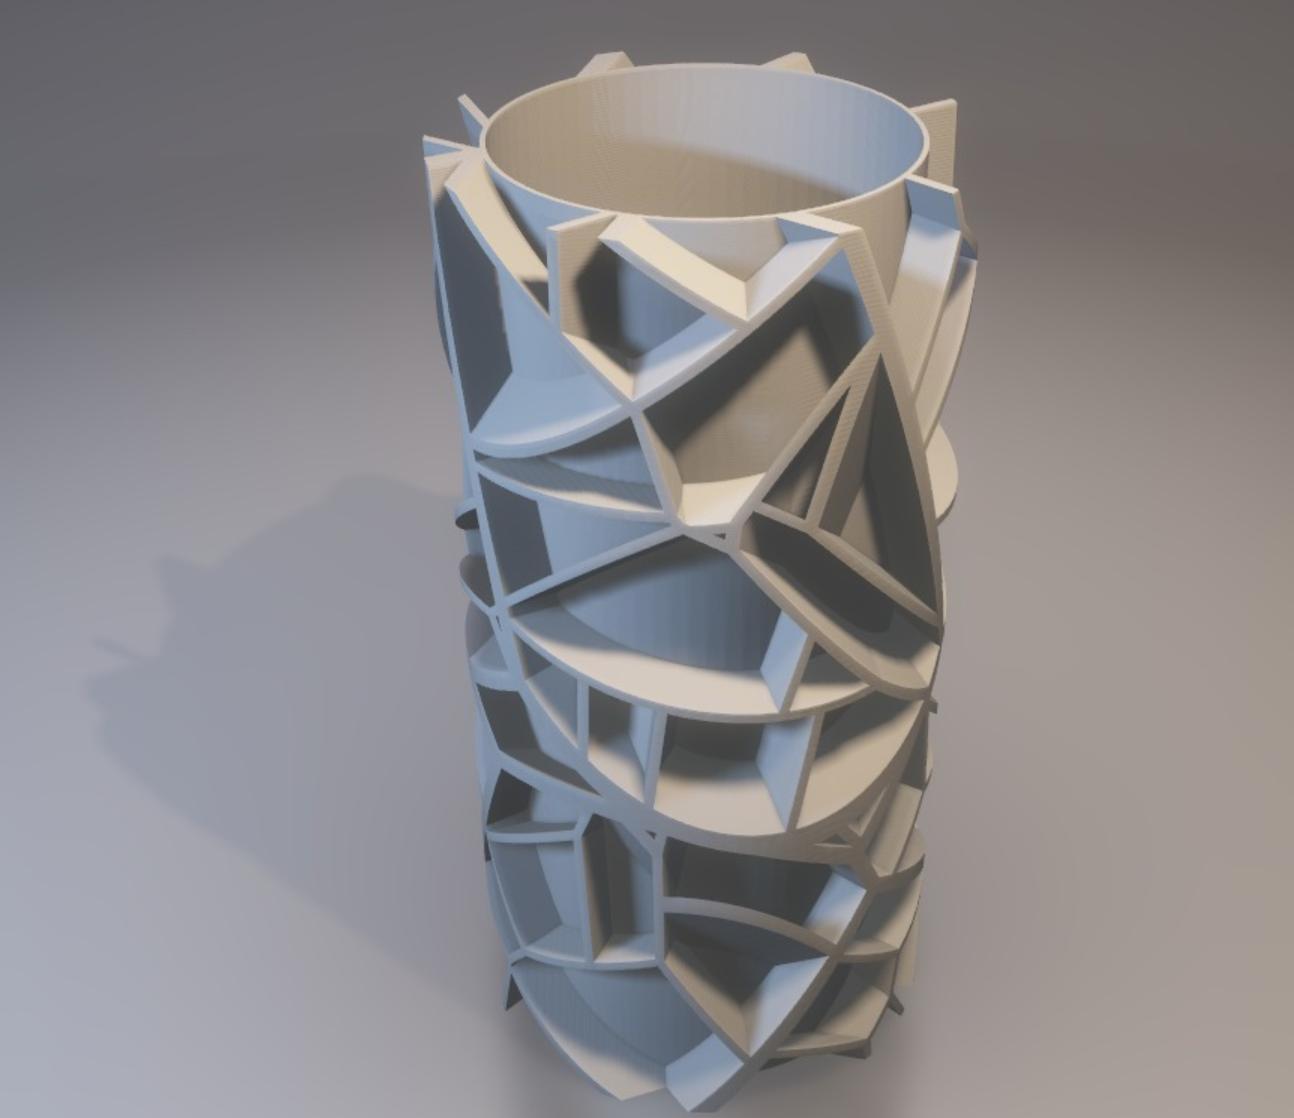 Capture d'écran 2017-11-28 à 18.40.34.png Download free STL file Voronoi vase (rounded or not) • 3D printable model, xTremePower